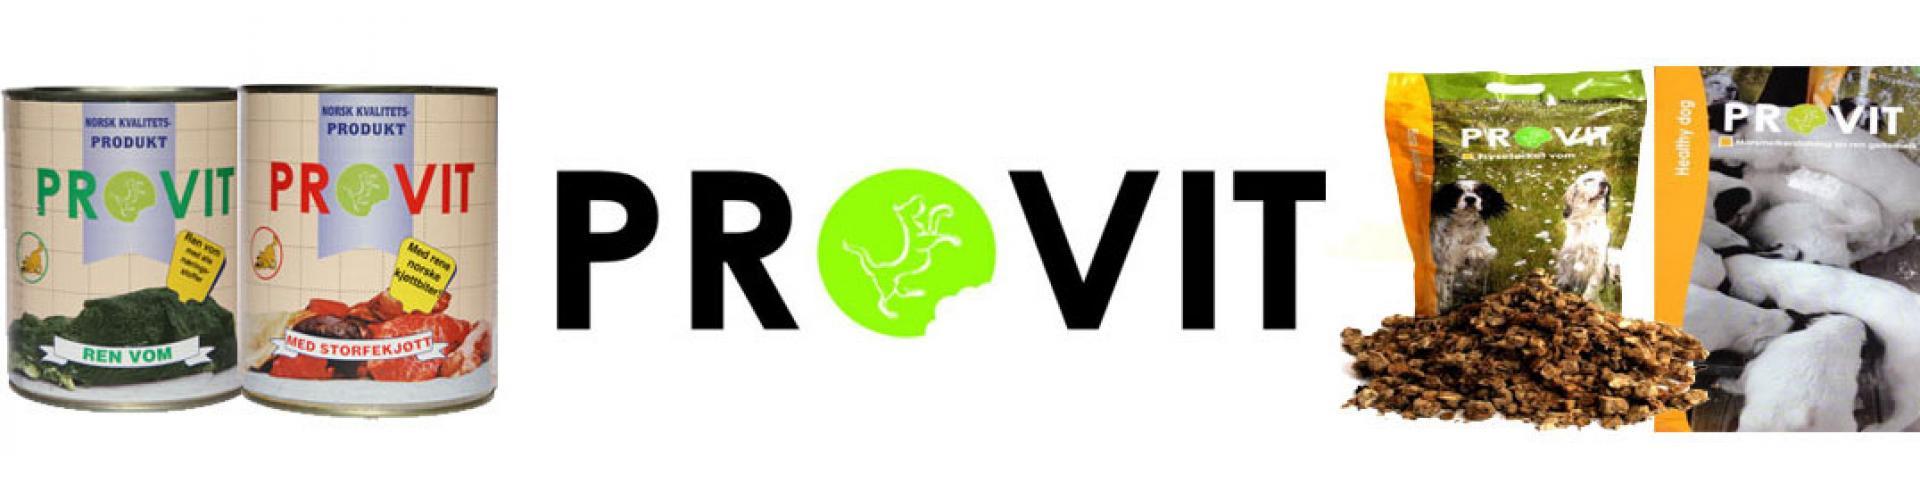 2provit-banner